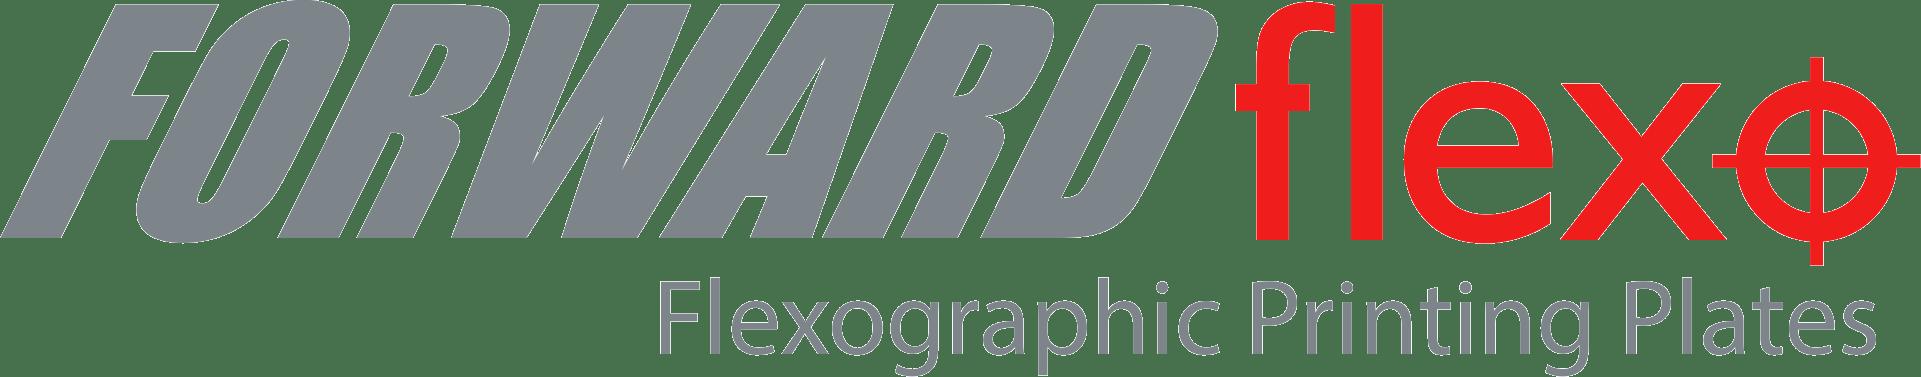 Forward Flexo Flexographic Printing Plates Logo